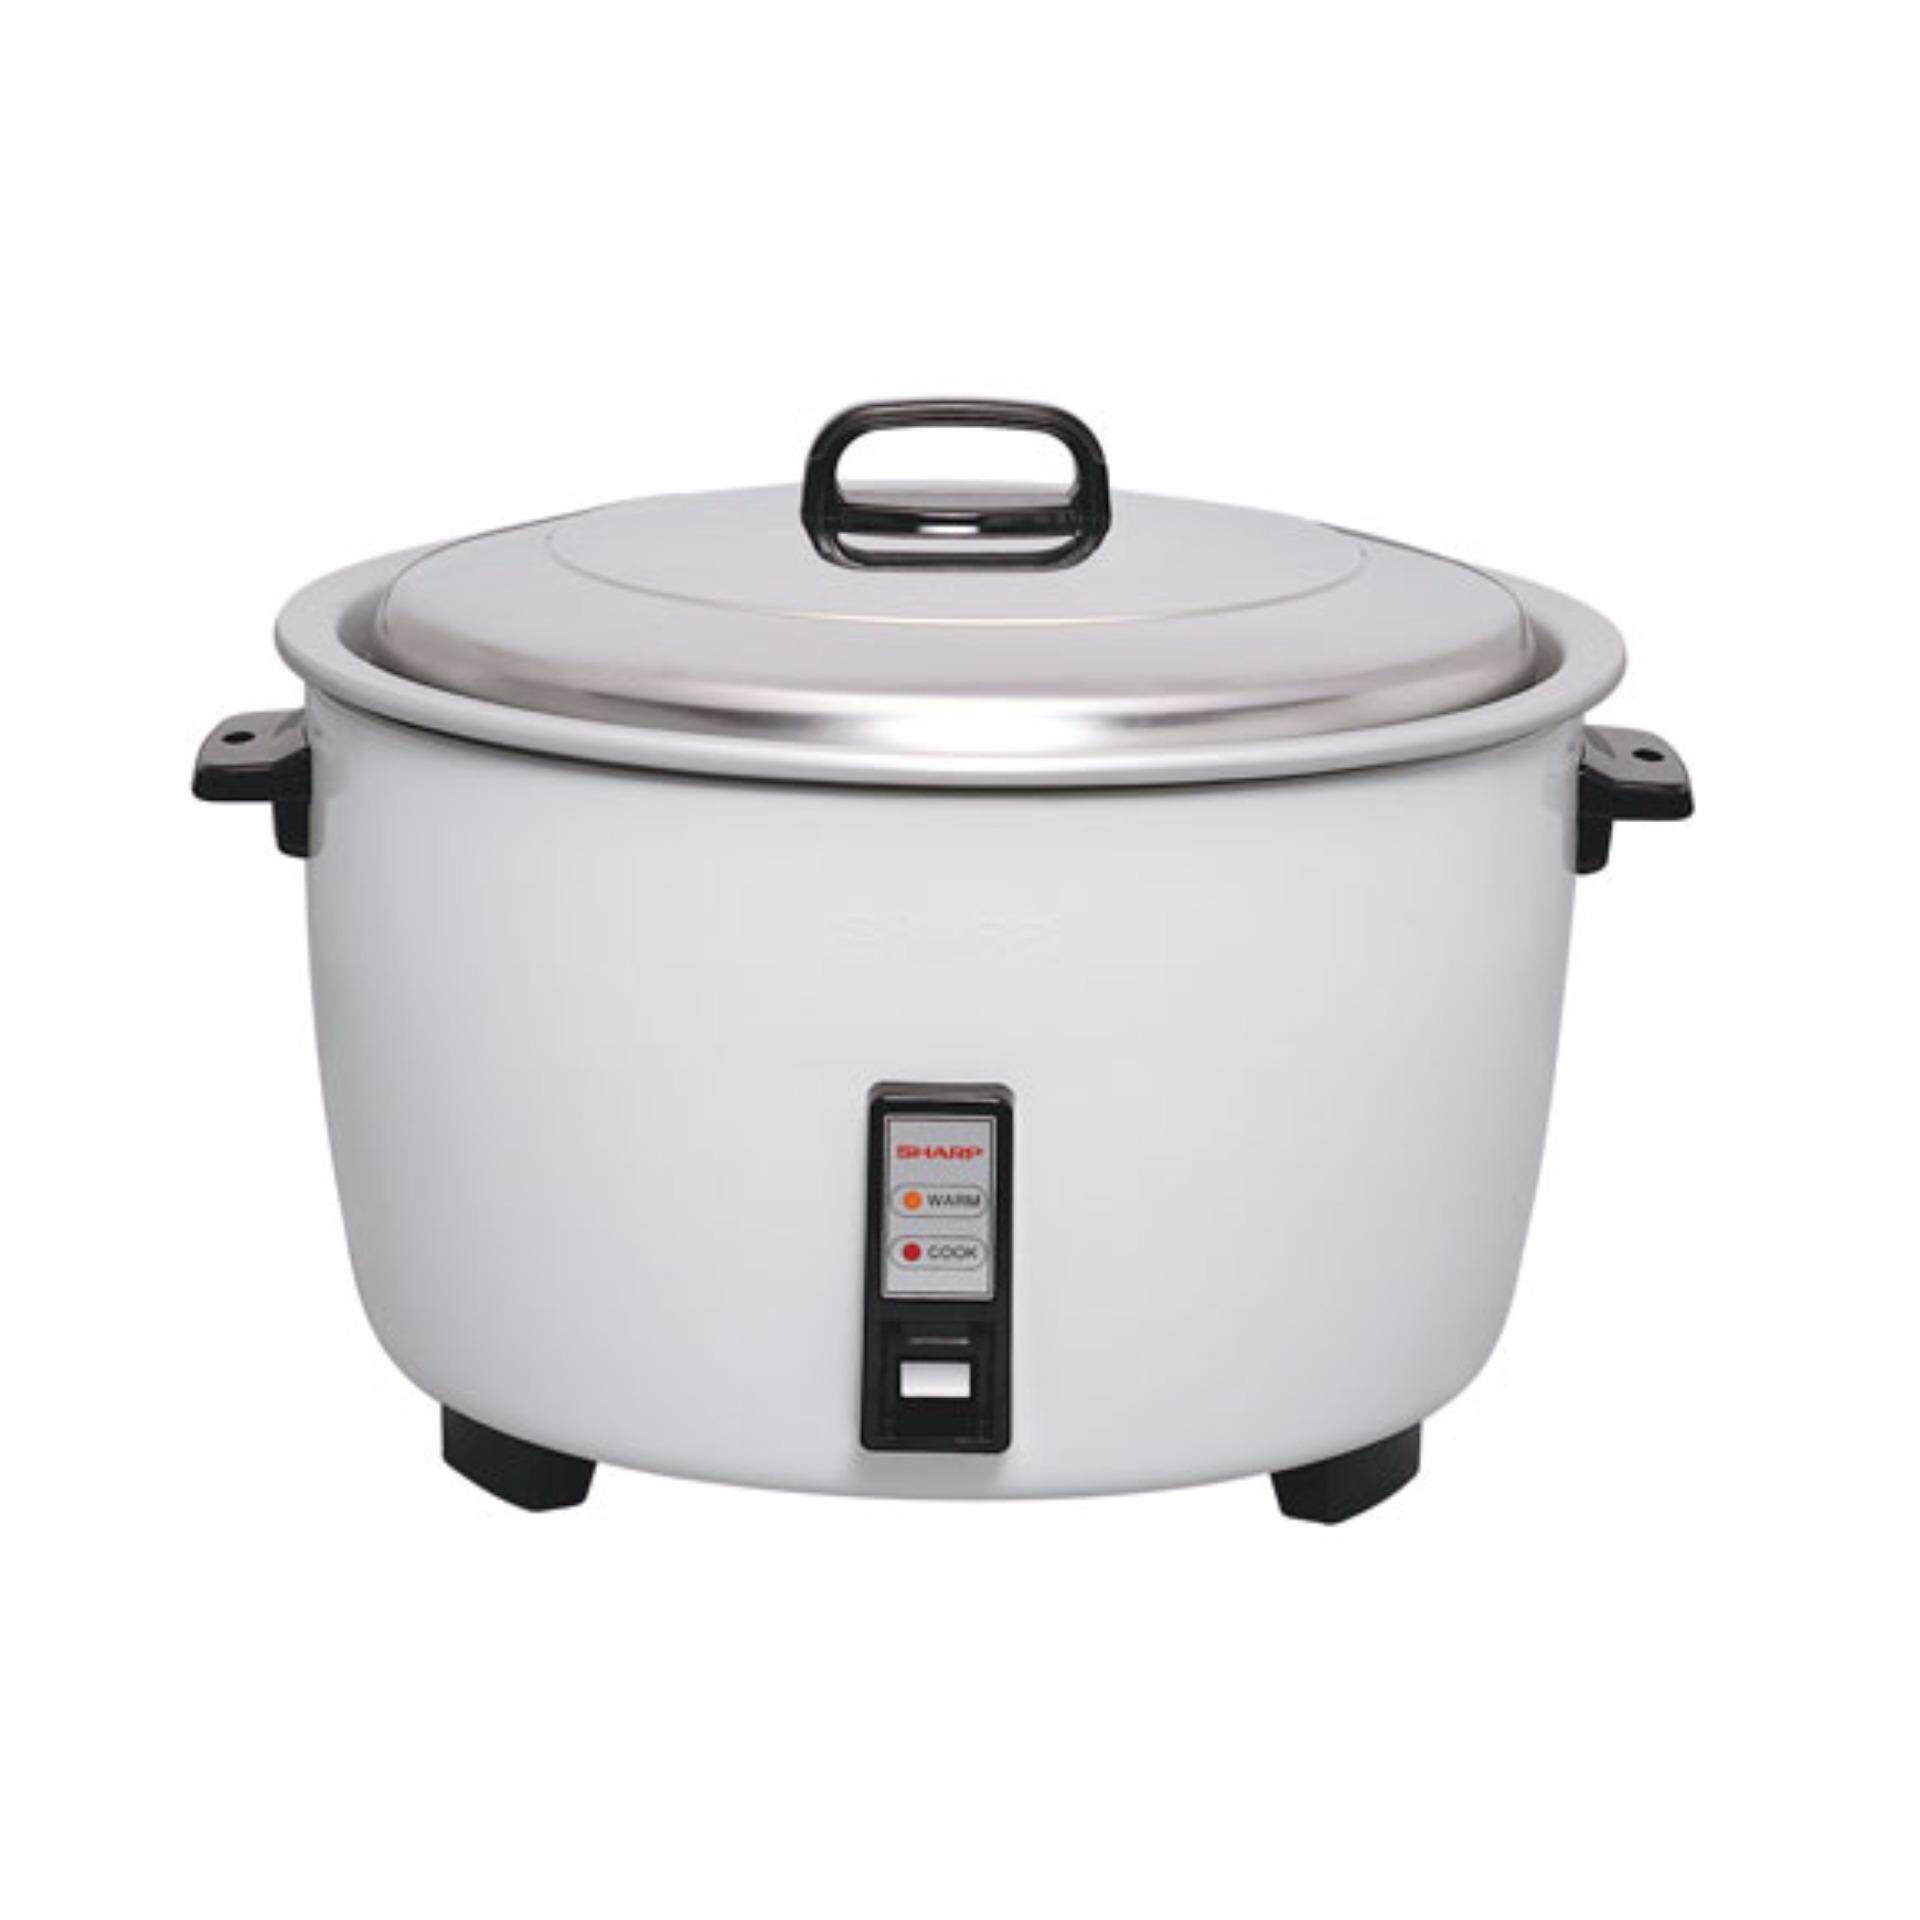 Sharp 7L Commercial Rice Cooker KSH-777